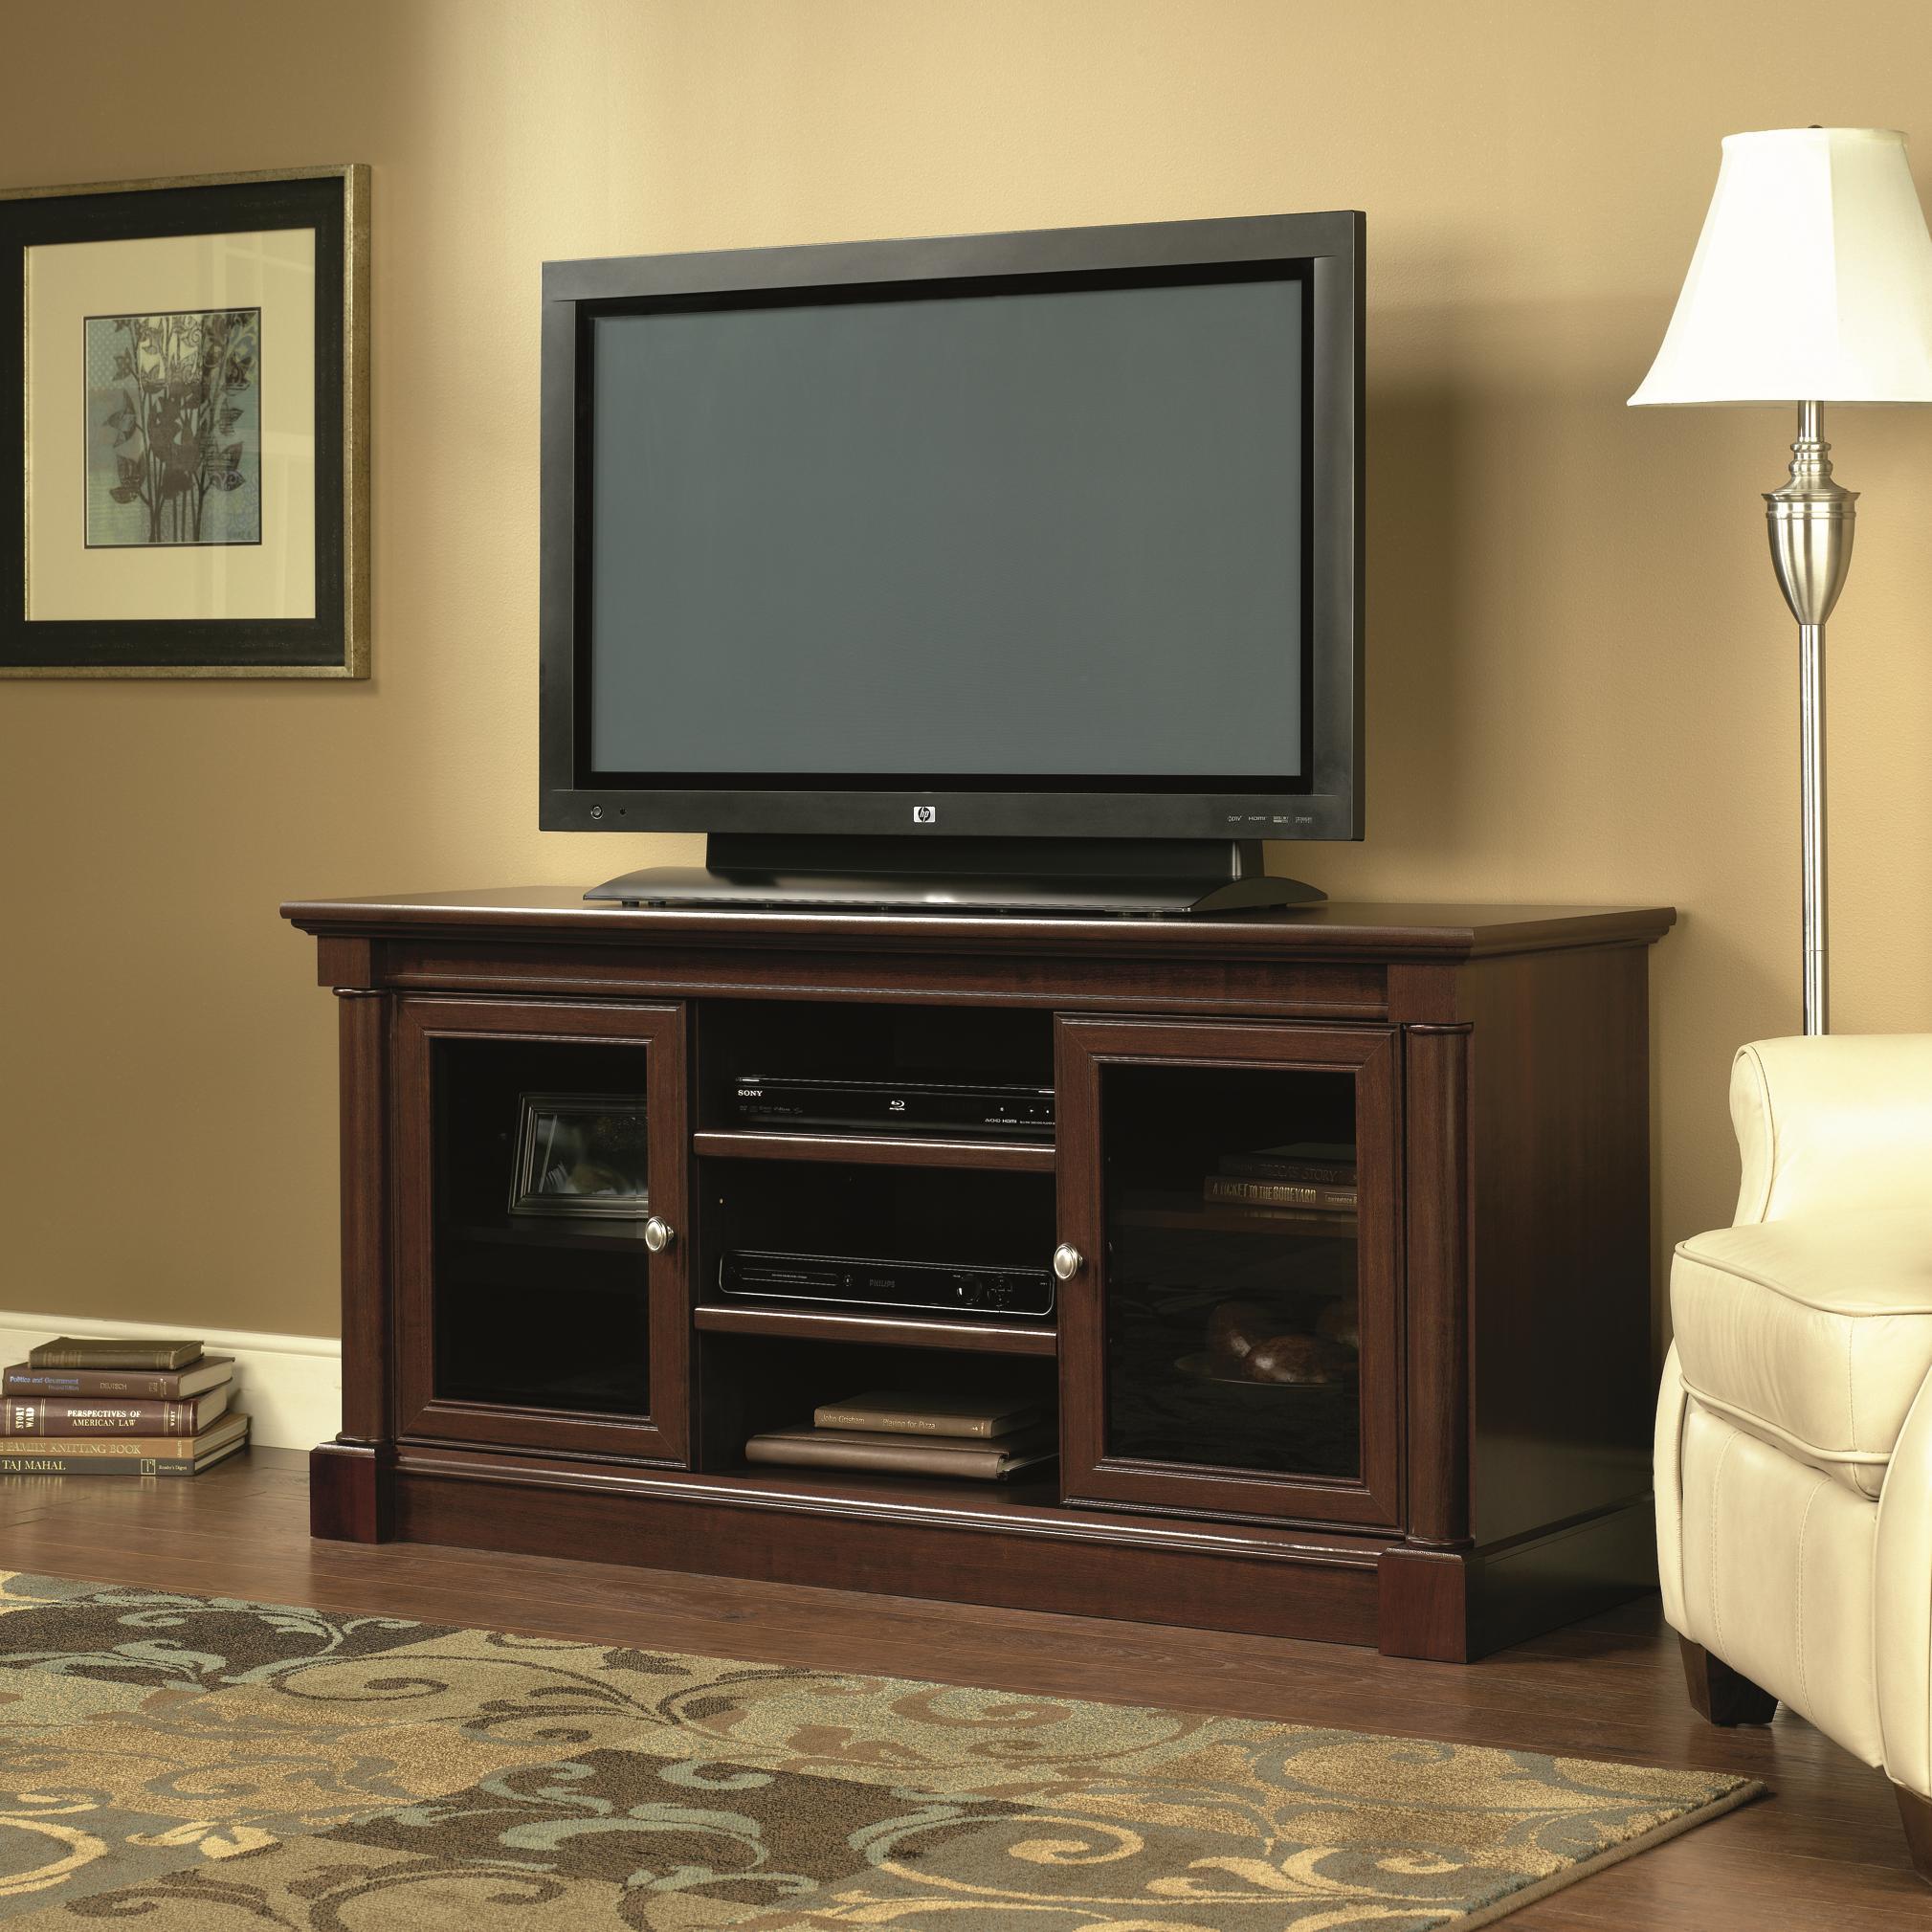 Palladia Entertainment Credenza by Sauder at Westrich Furniture & Appliances